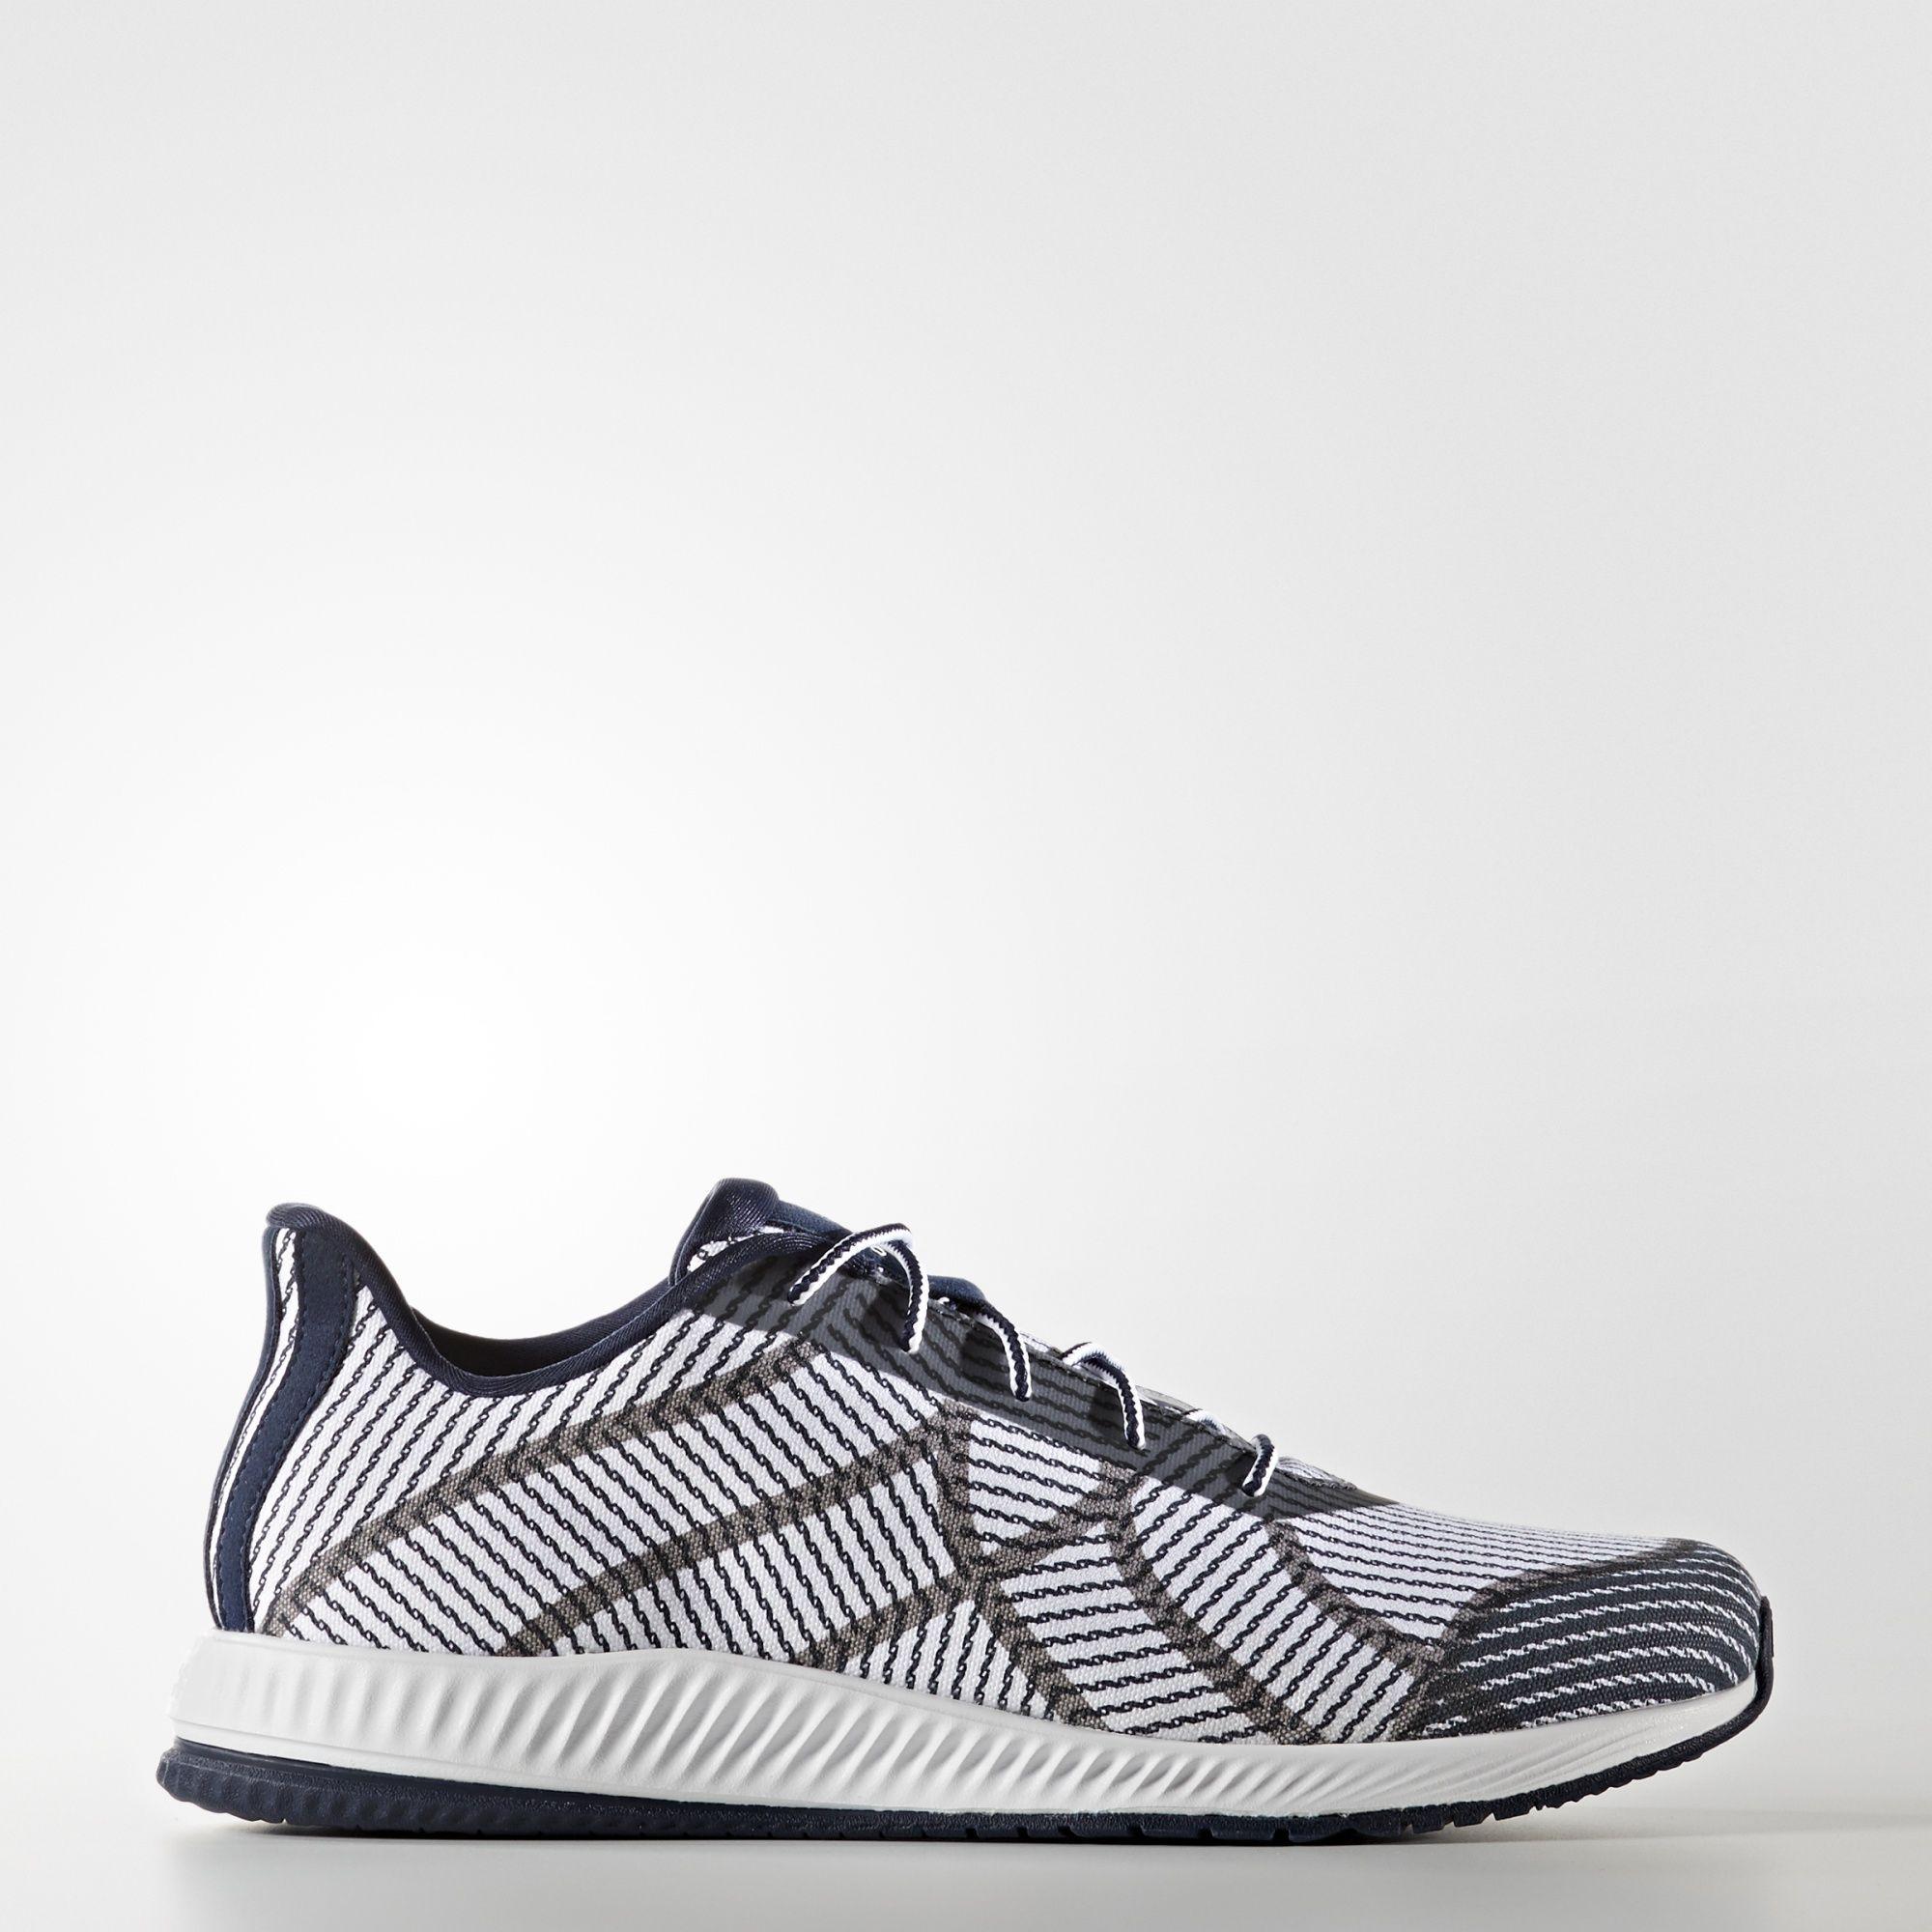 adidas - Gymbreaker bounce B. Adidas CanadaFitness ...